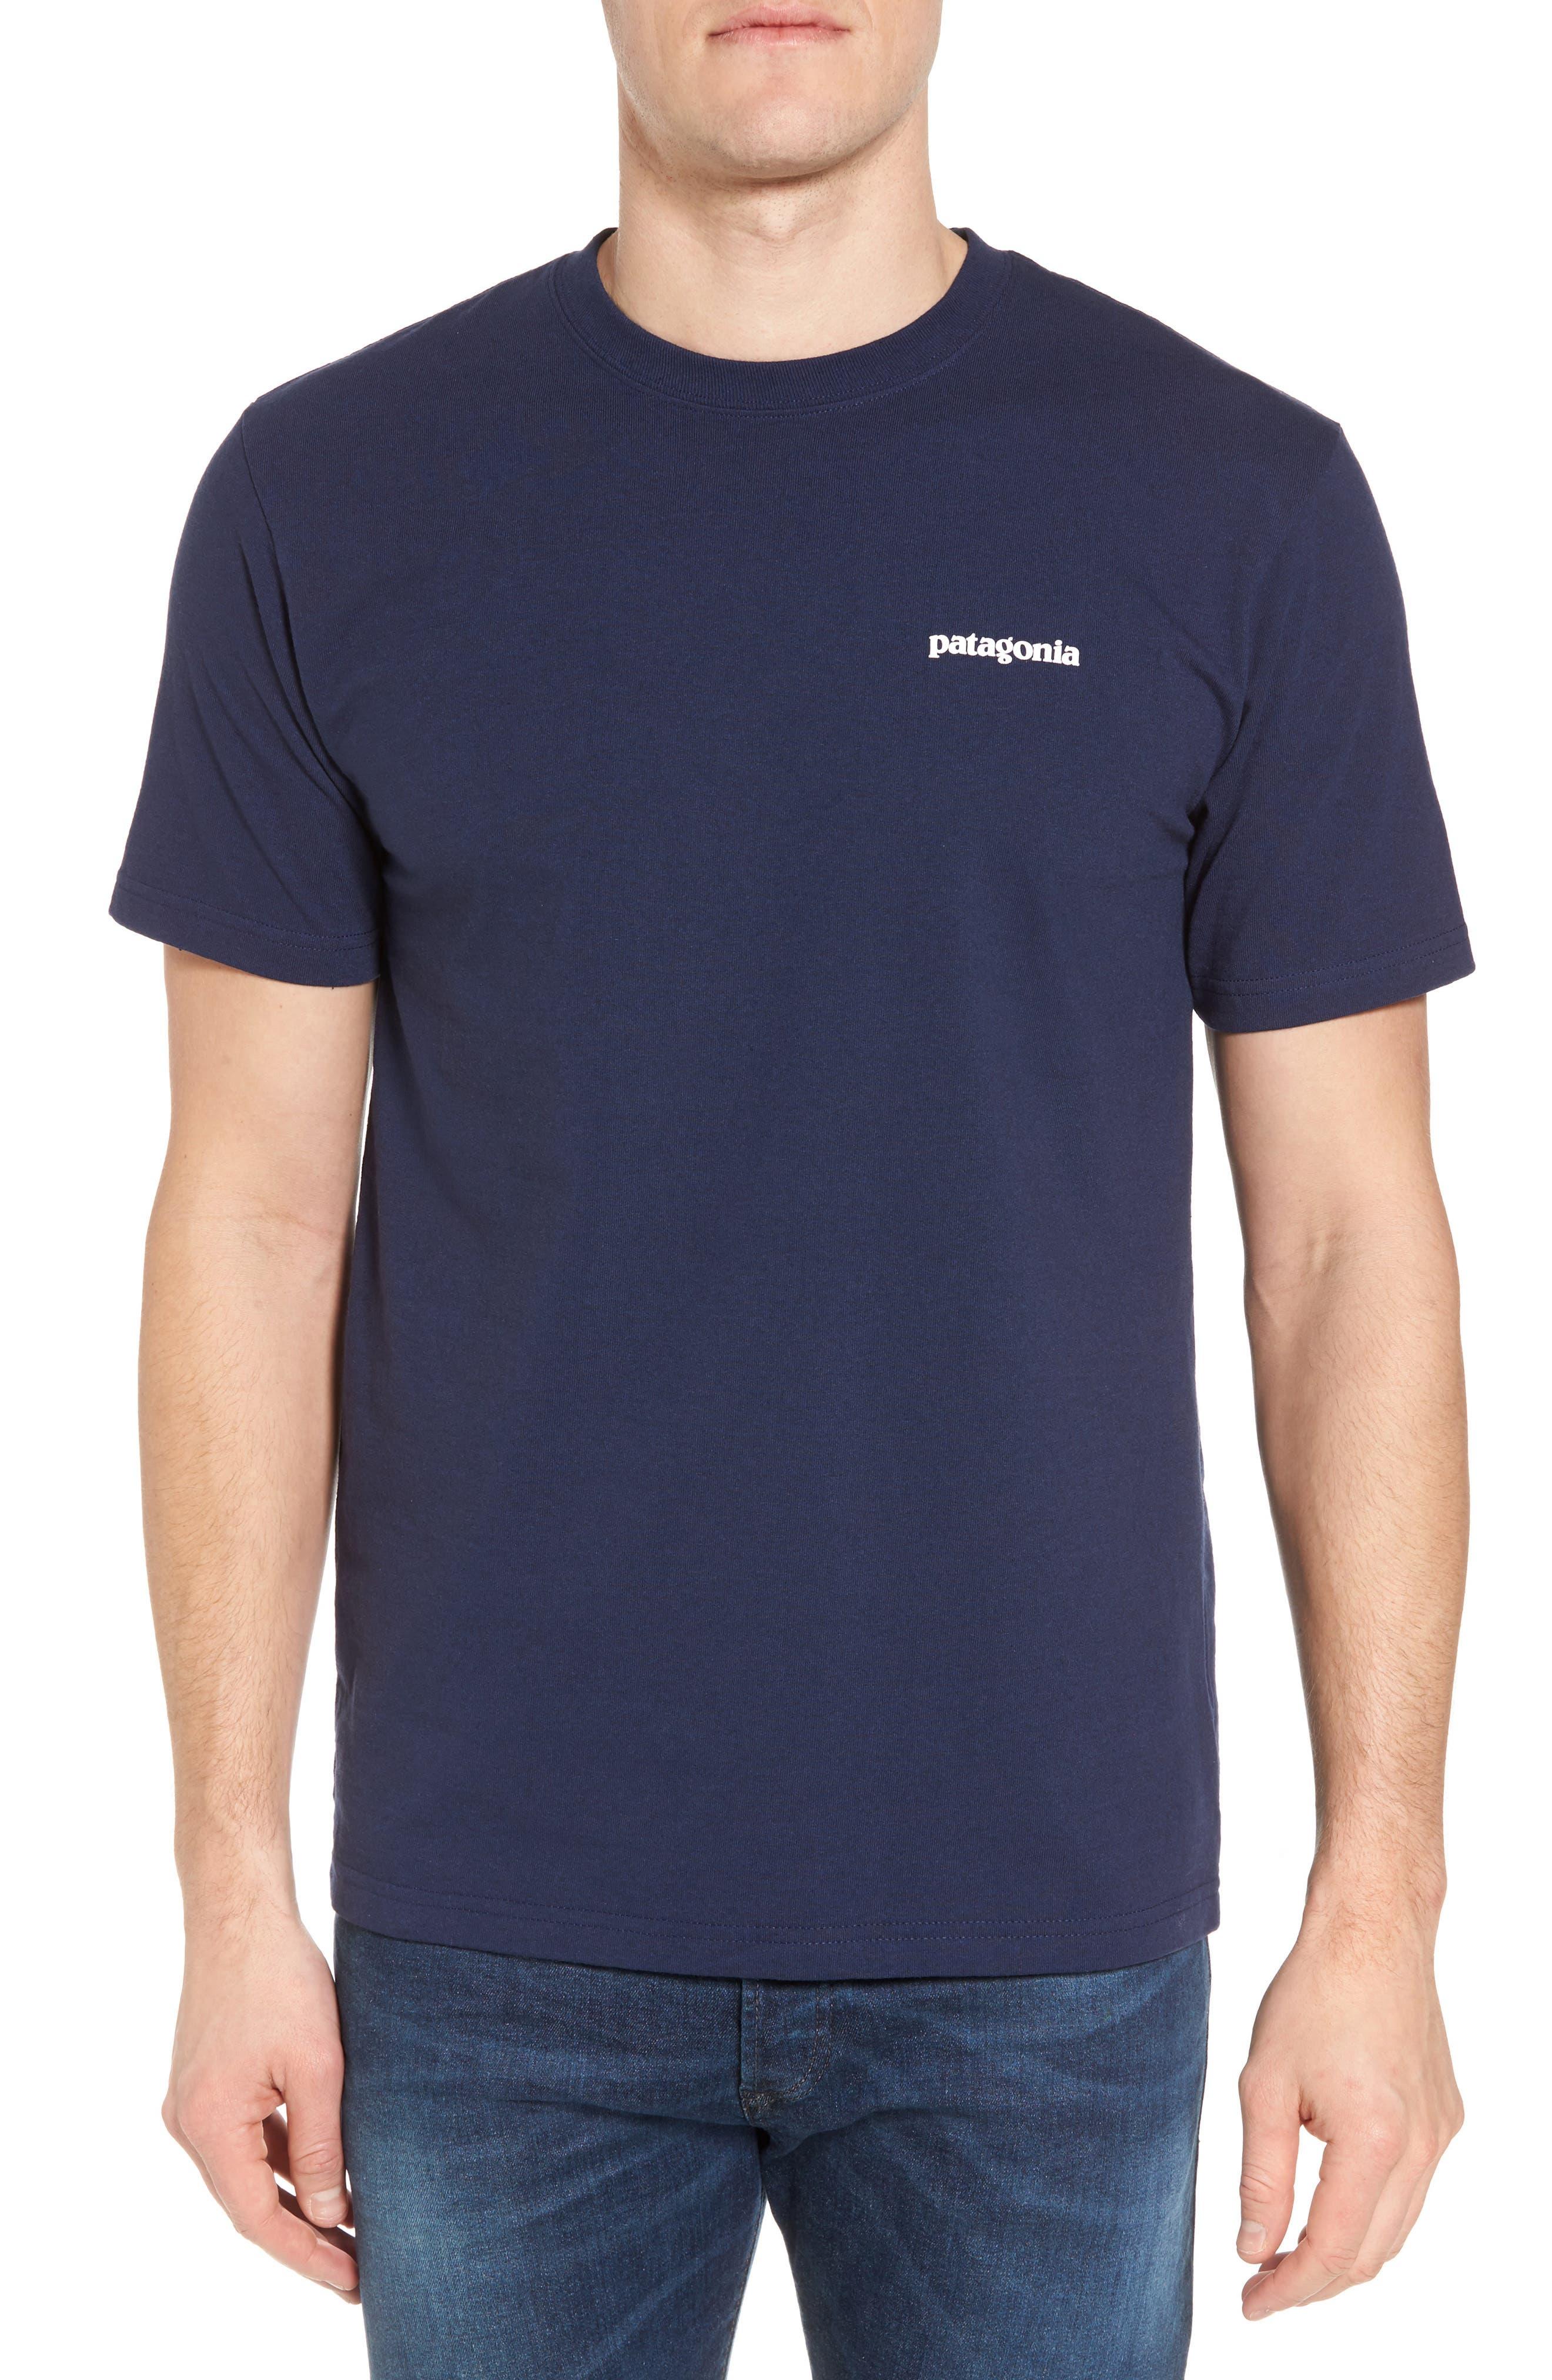 Patagonia Responsibili-Tee T-Shirt, Blue